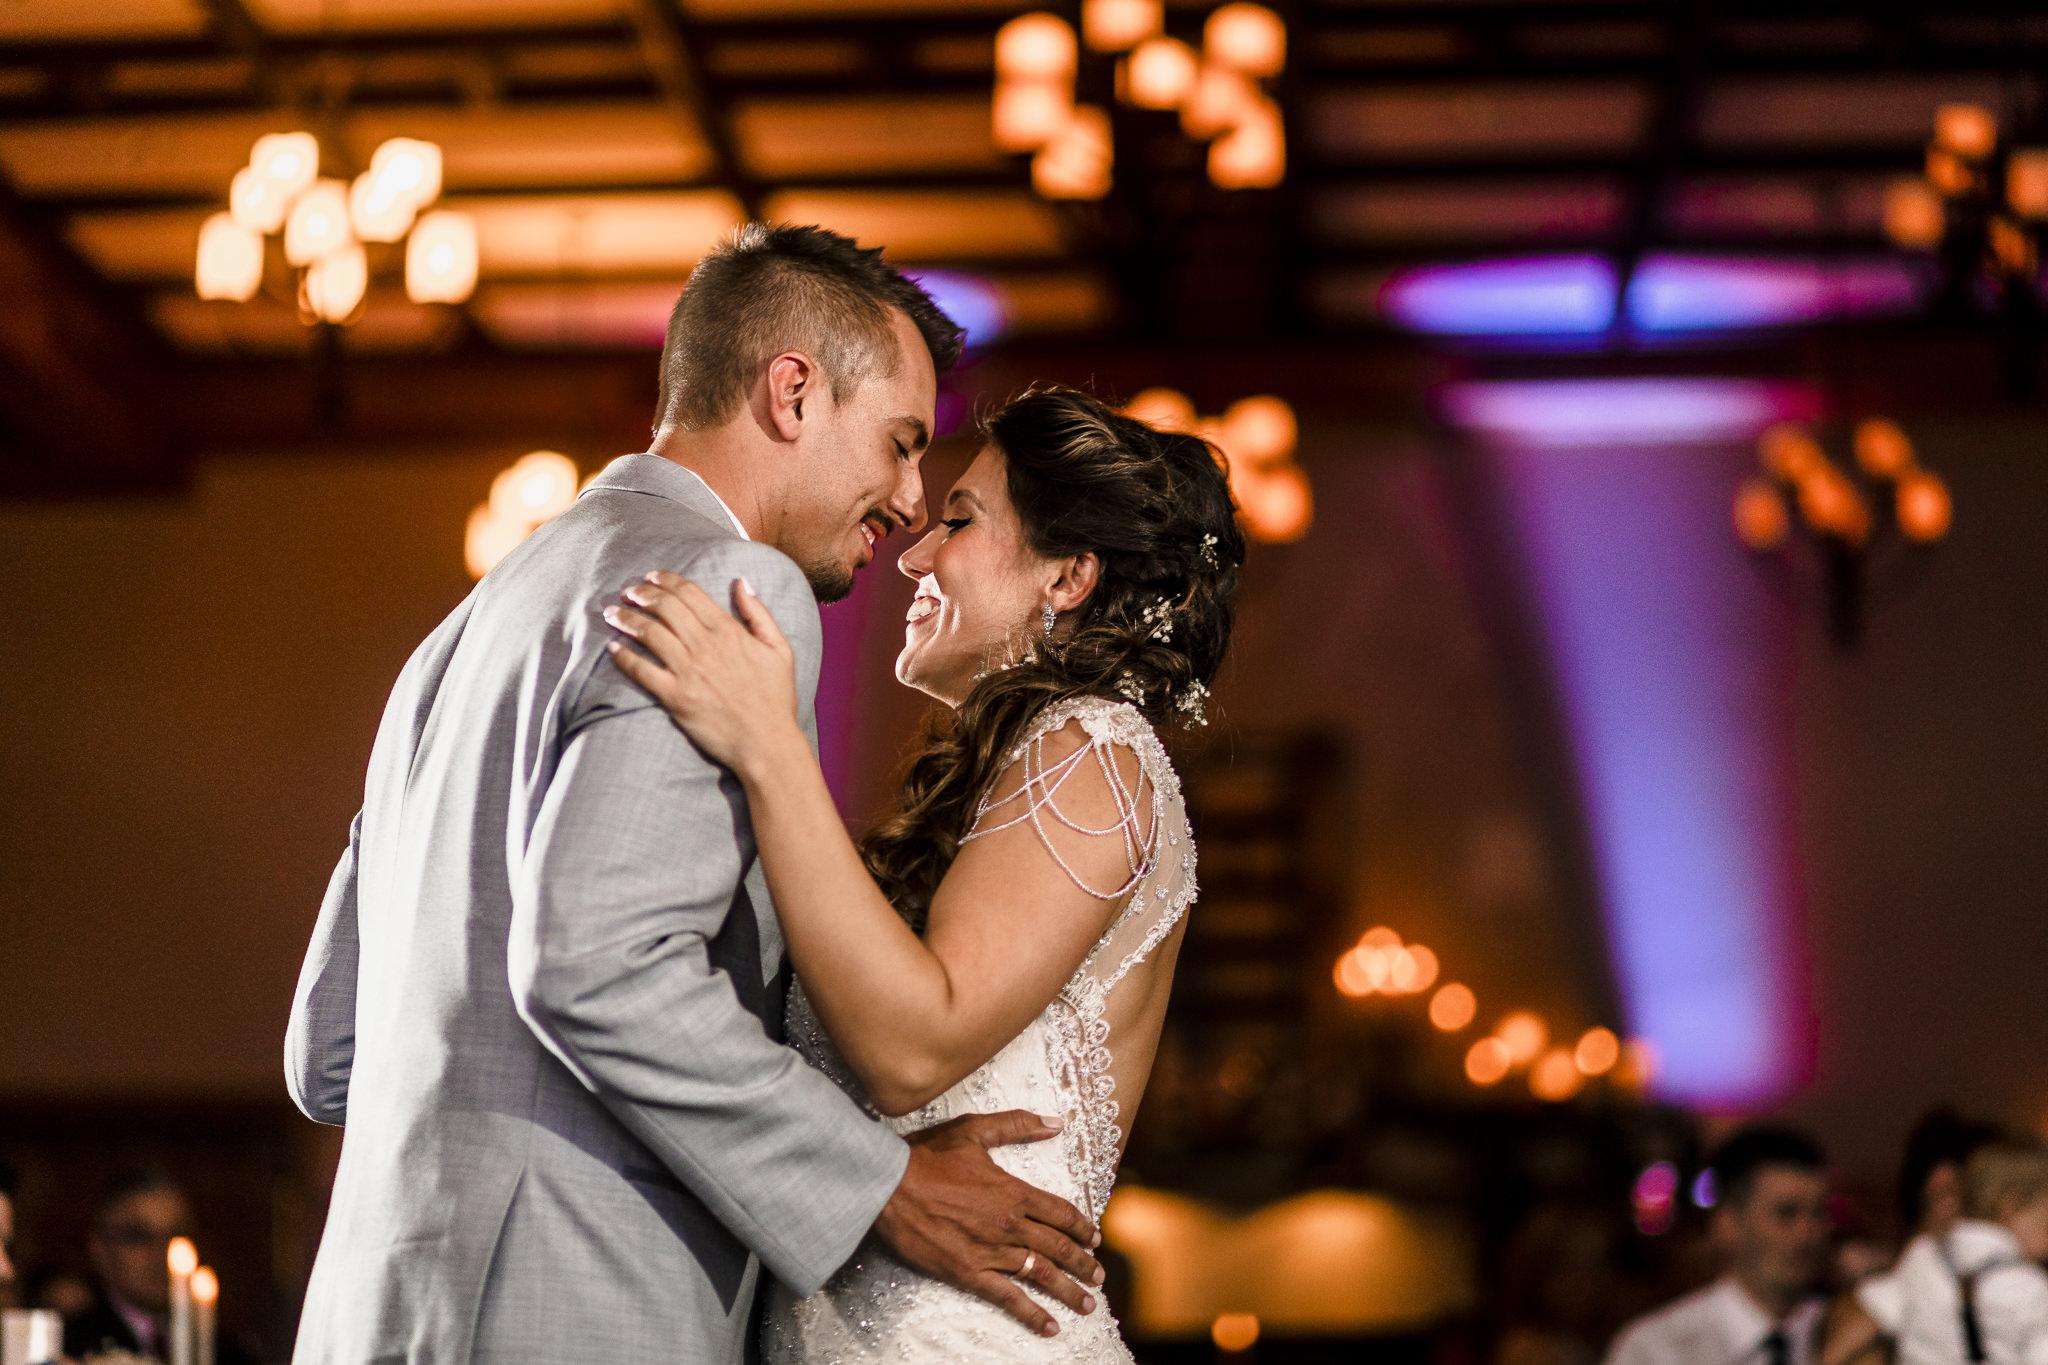 Barbato-Moorestown-Community-House-Wedding-New-Jersey-Photographer-29.JPG